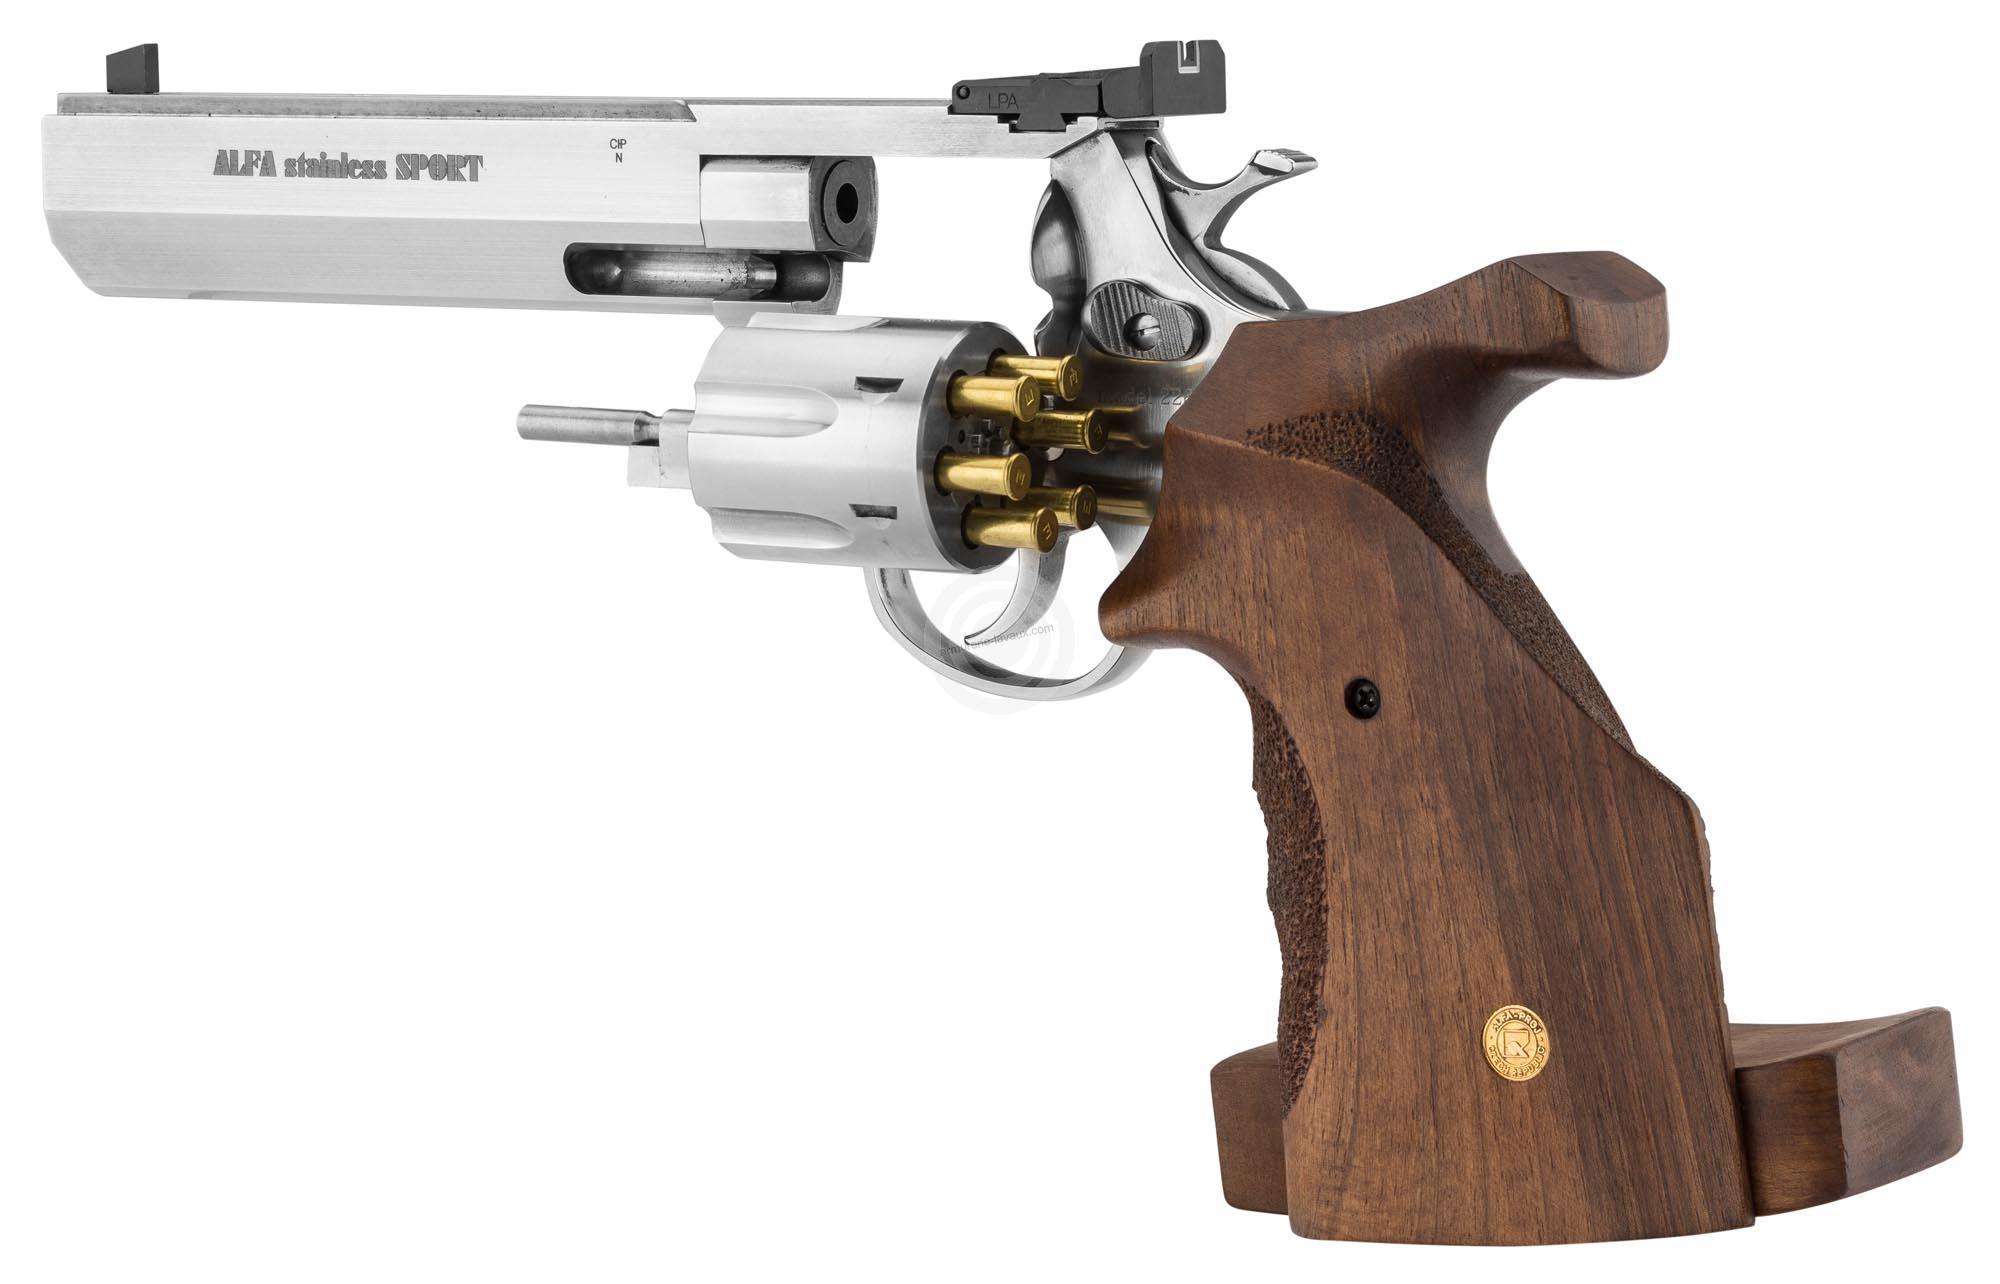 revolver alfa proj sport 6 u0026 39  u0026 39  inox cal 22 lr